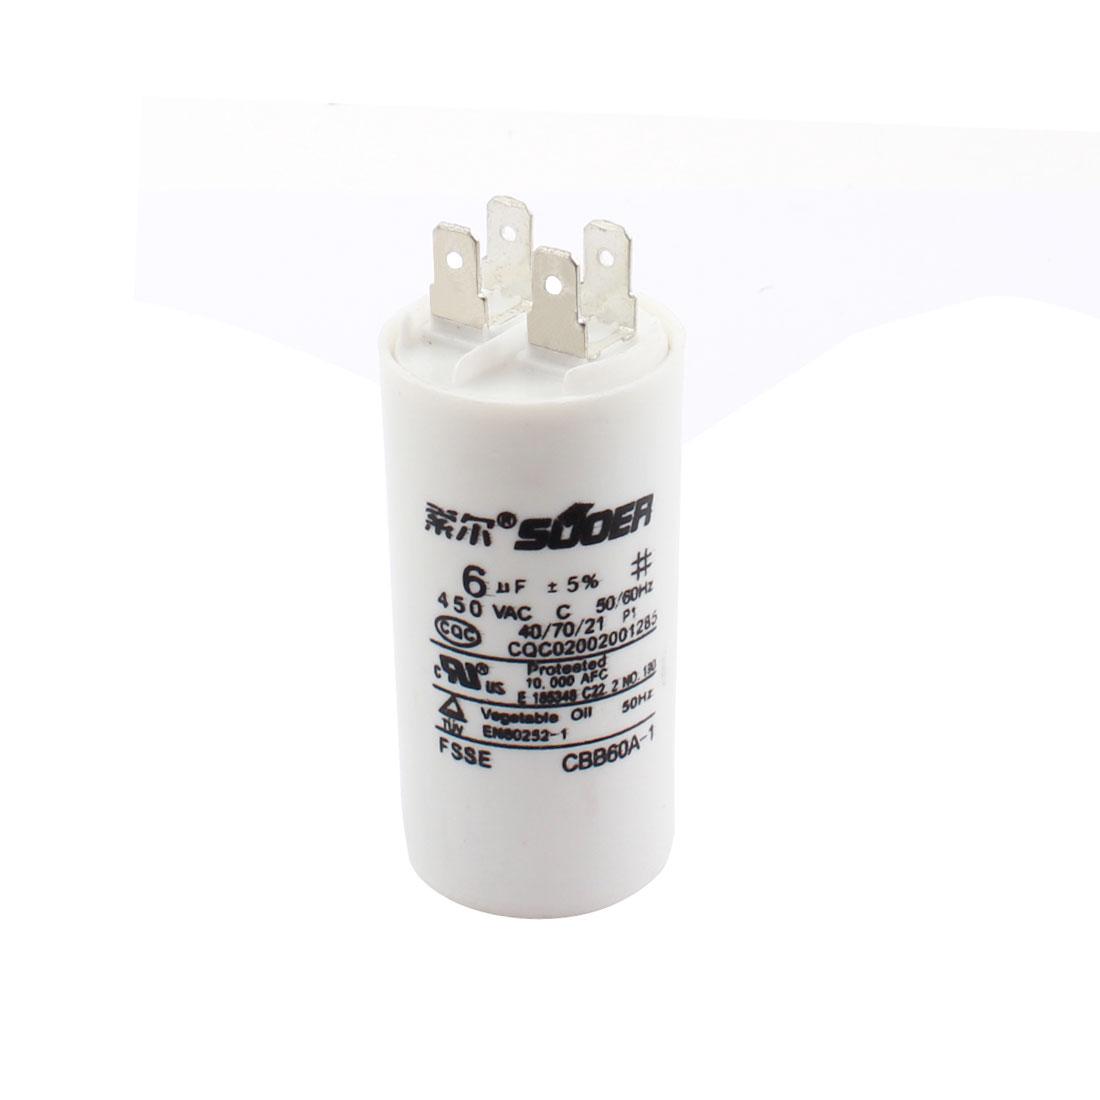 AC450V 6uF 5% Tolerance 4 Lug Terminals Cylinder Polypropylene Film Washing Machine Motor Running Capacitor White